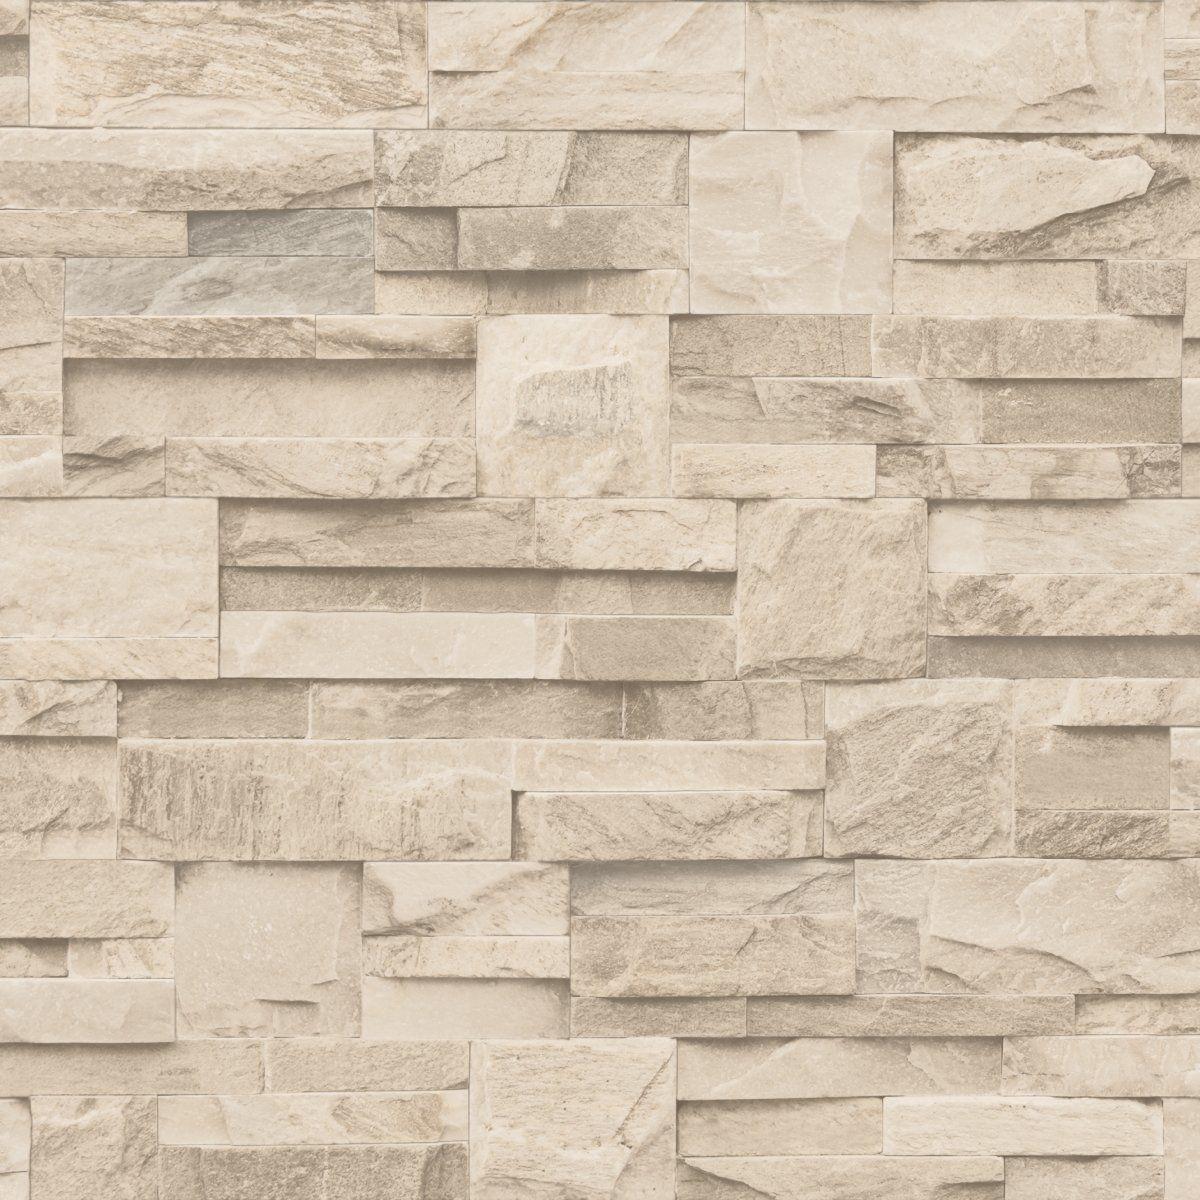 Vinyl for brick wall - New Luxury Muriva Slate Stone Brick Wall Effect Textured Vinyl Wallpaper Beige J27407 Amazon